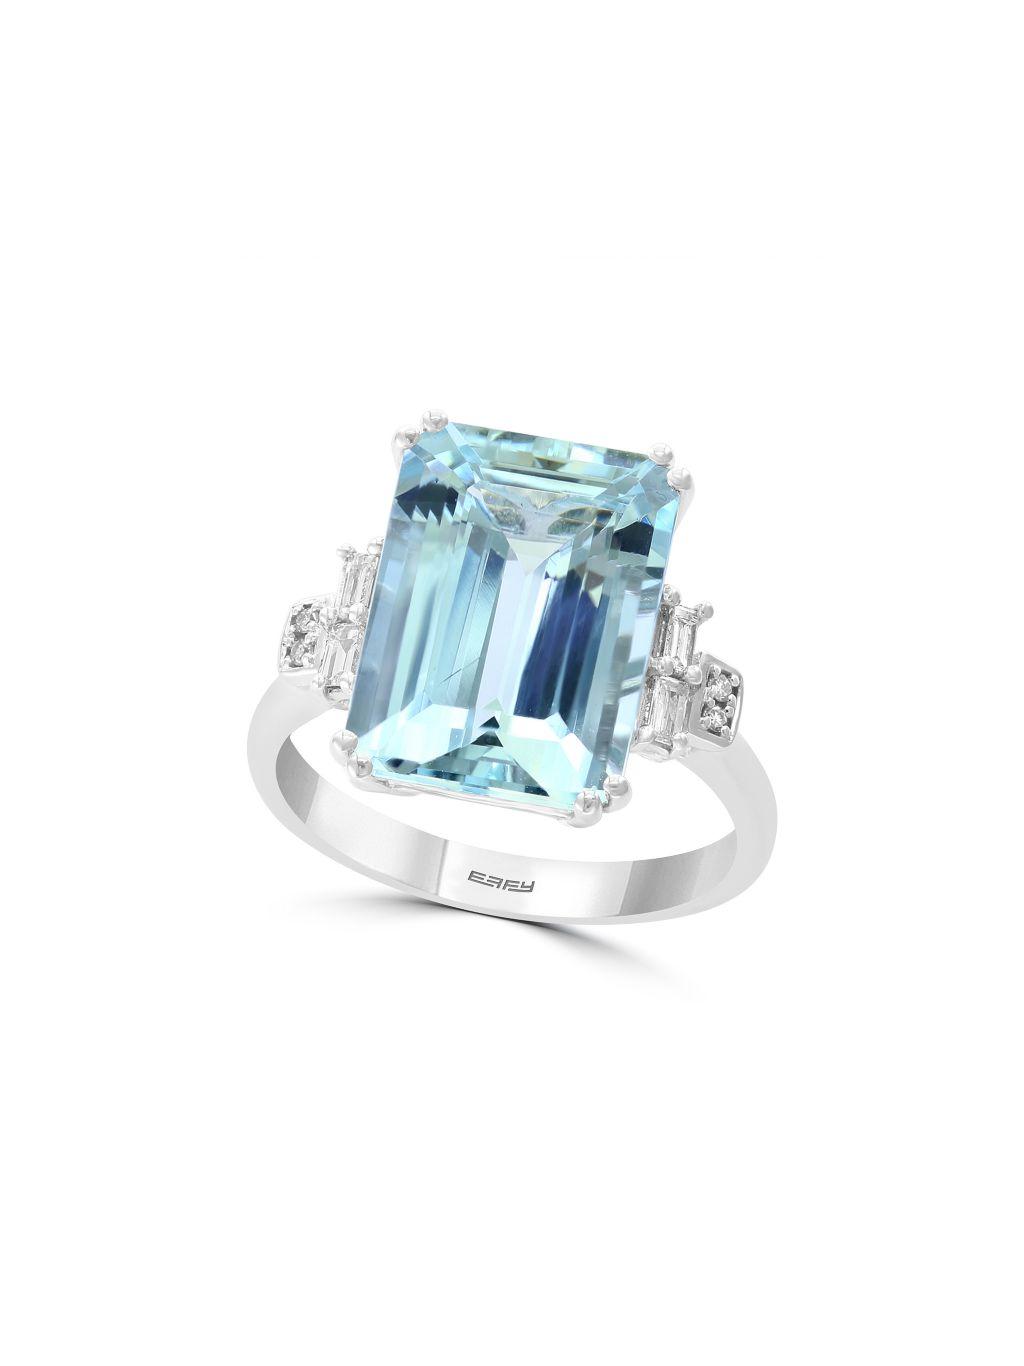 Effy 14K White Gold, Aquamarine & Diamond Solitaire Ring